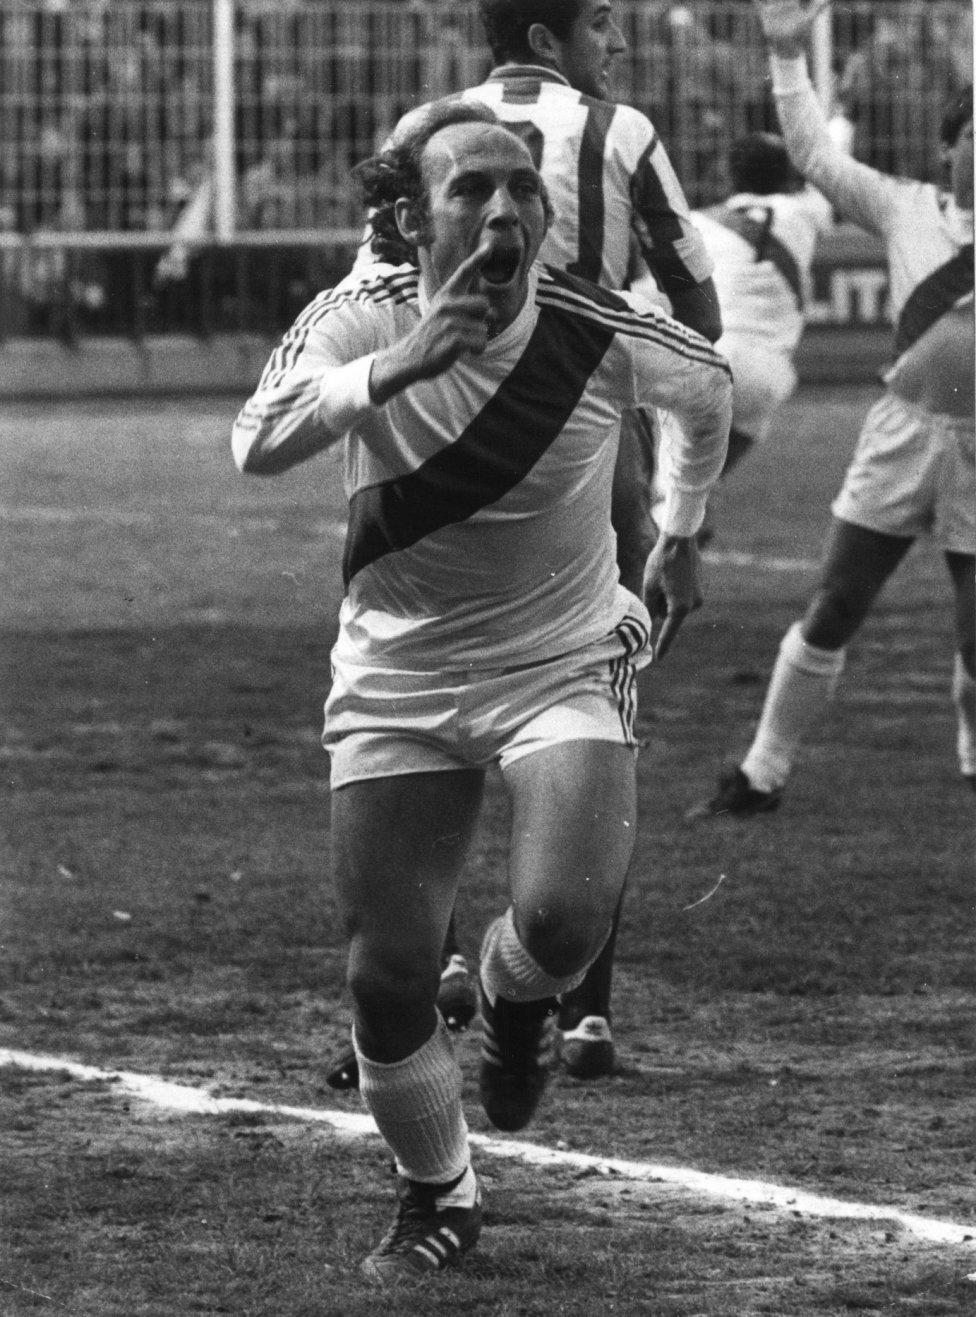 Manuel Clares